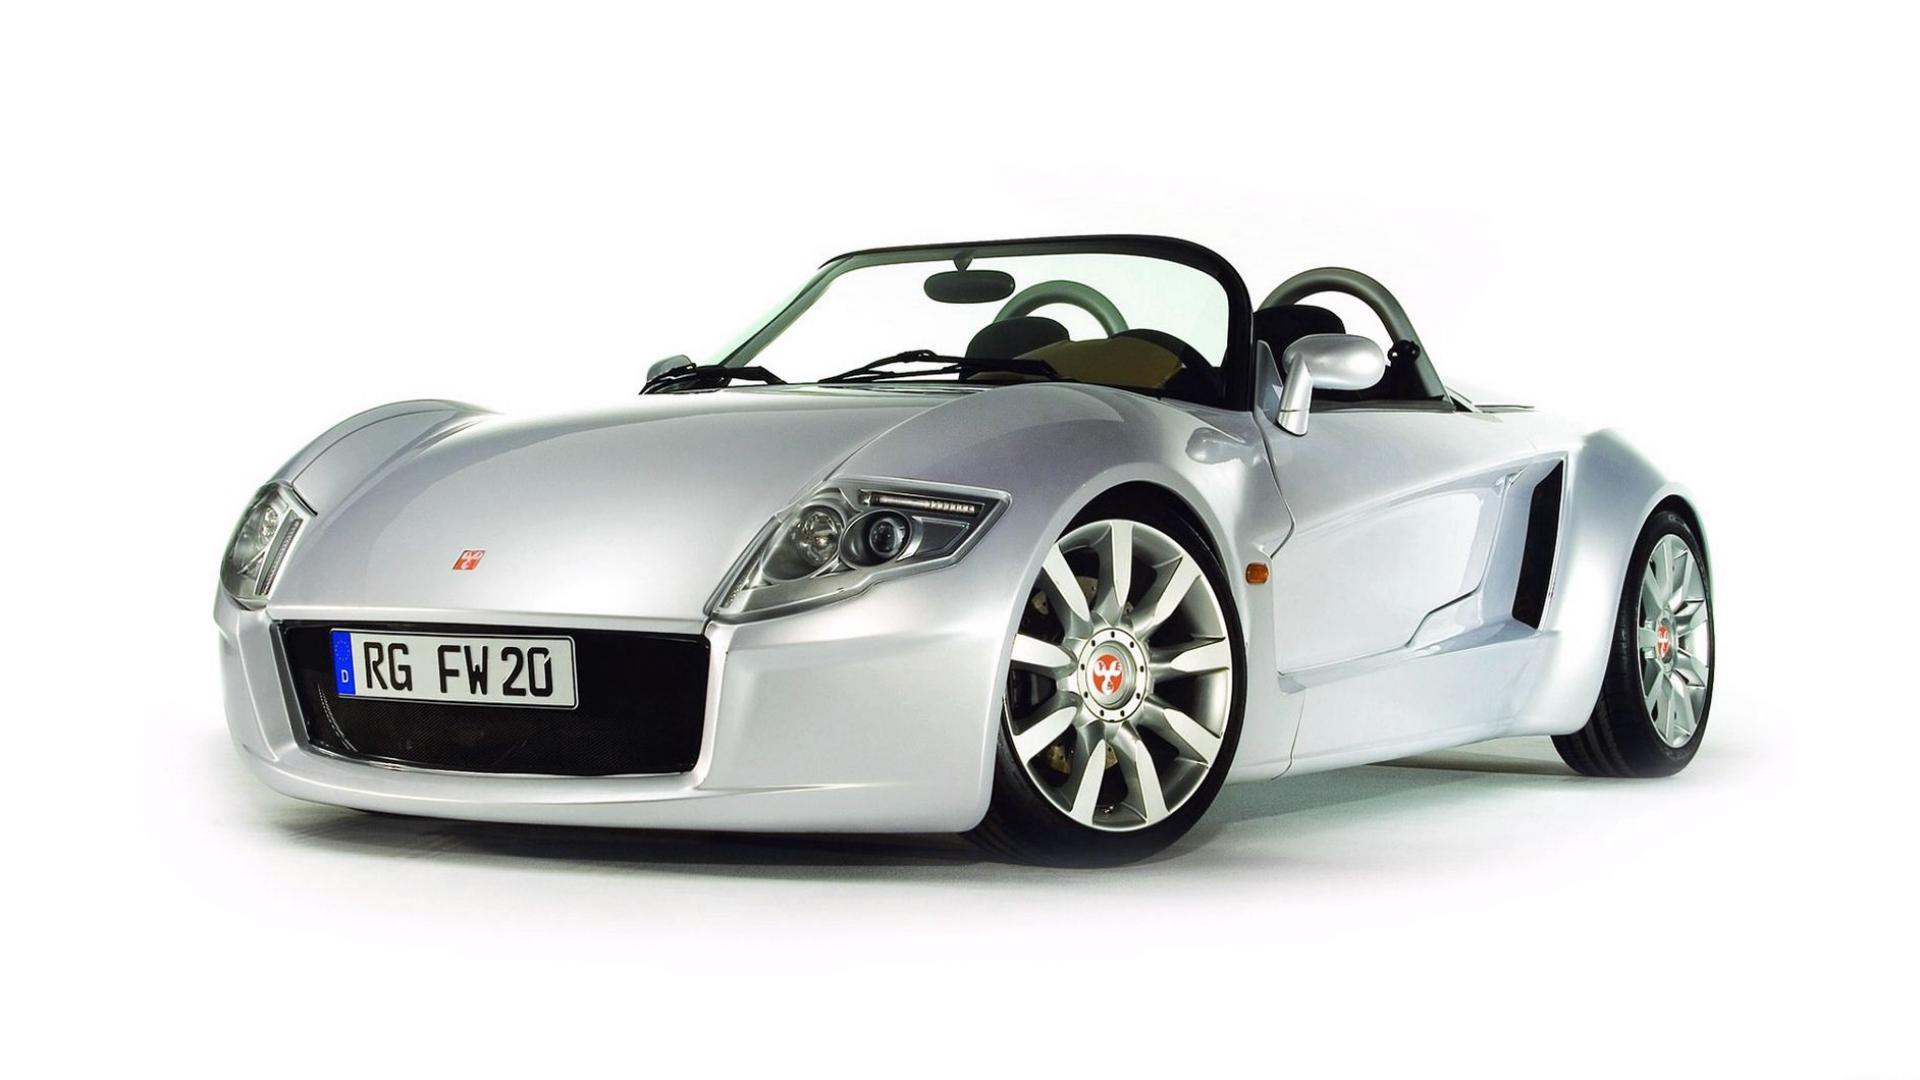 Автомобиль белый фон обои для рабочего стола, картинки ...: http://hq-wallpapers.ru/wallpapers/cars/pic13136_raz1920x1080